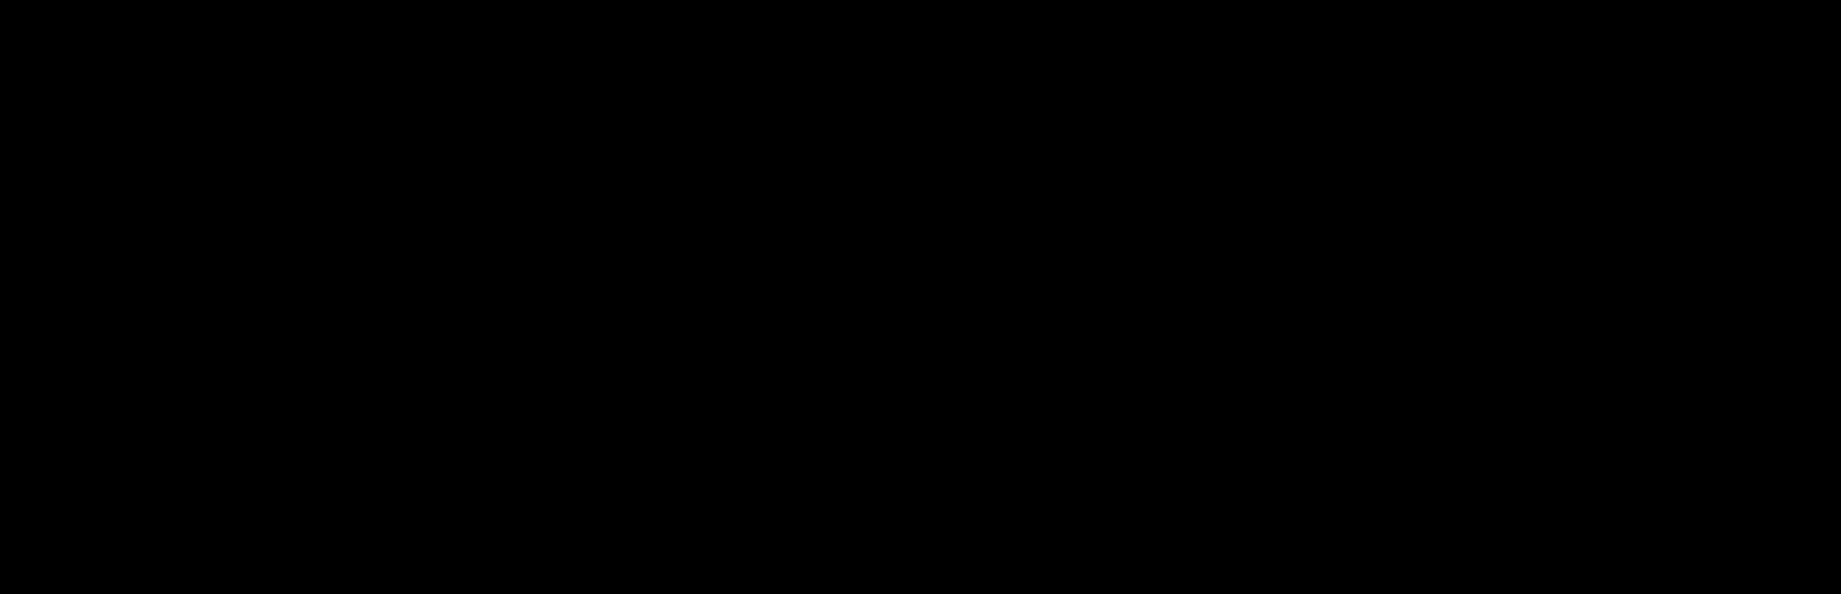 Suberoylanilide hydroxamic acid-<sup>13</sup>C<sub>6</sub>,<sup>15</sup>N (<sup>13</sup>C<sub>6</sub>,<sup>15</sup>N-SAHA)